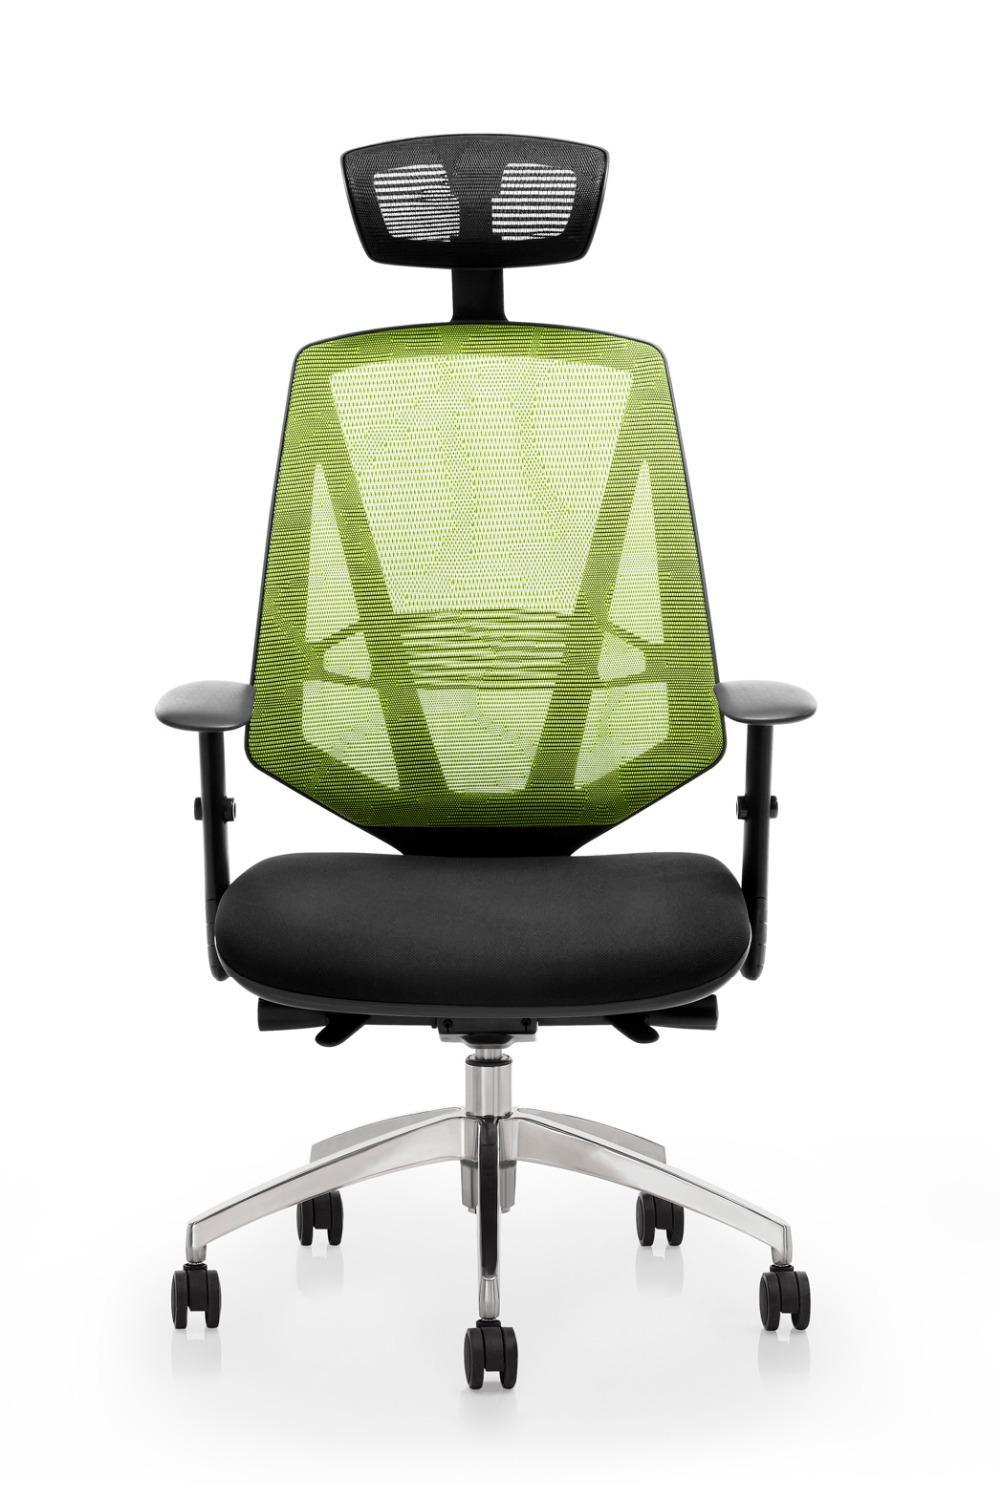 Transpirable coj n silla ergon mica coj n silla de for Cojin lumbar silla oficina